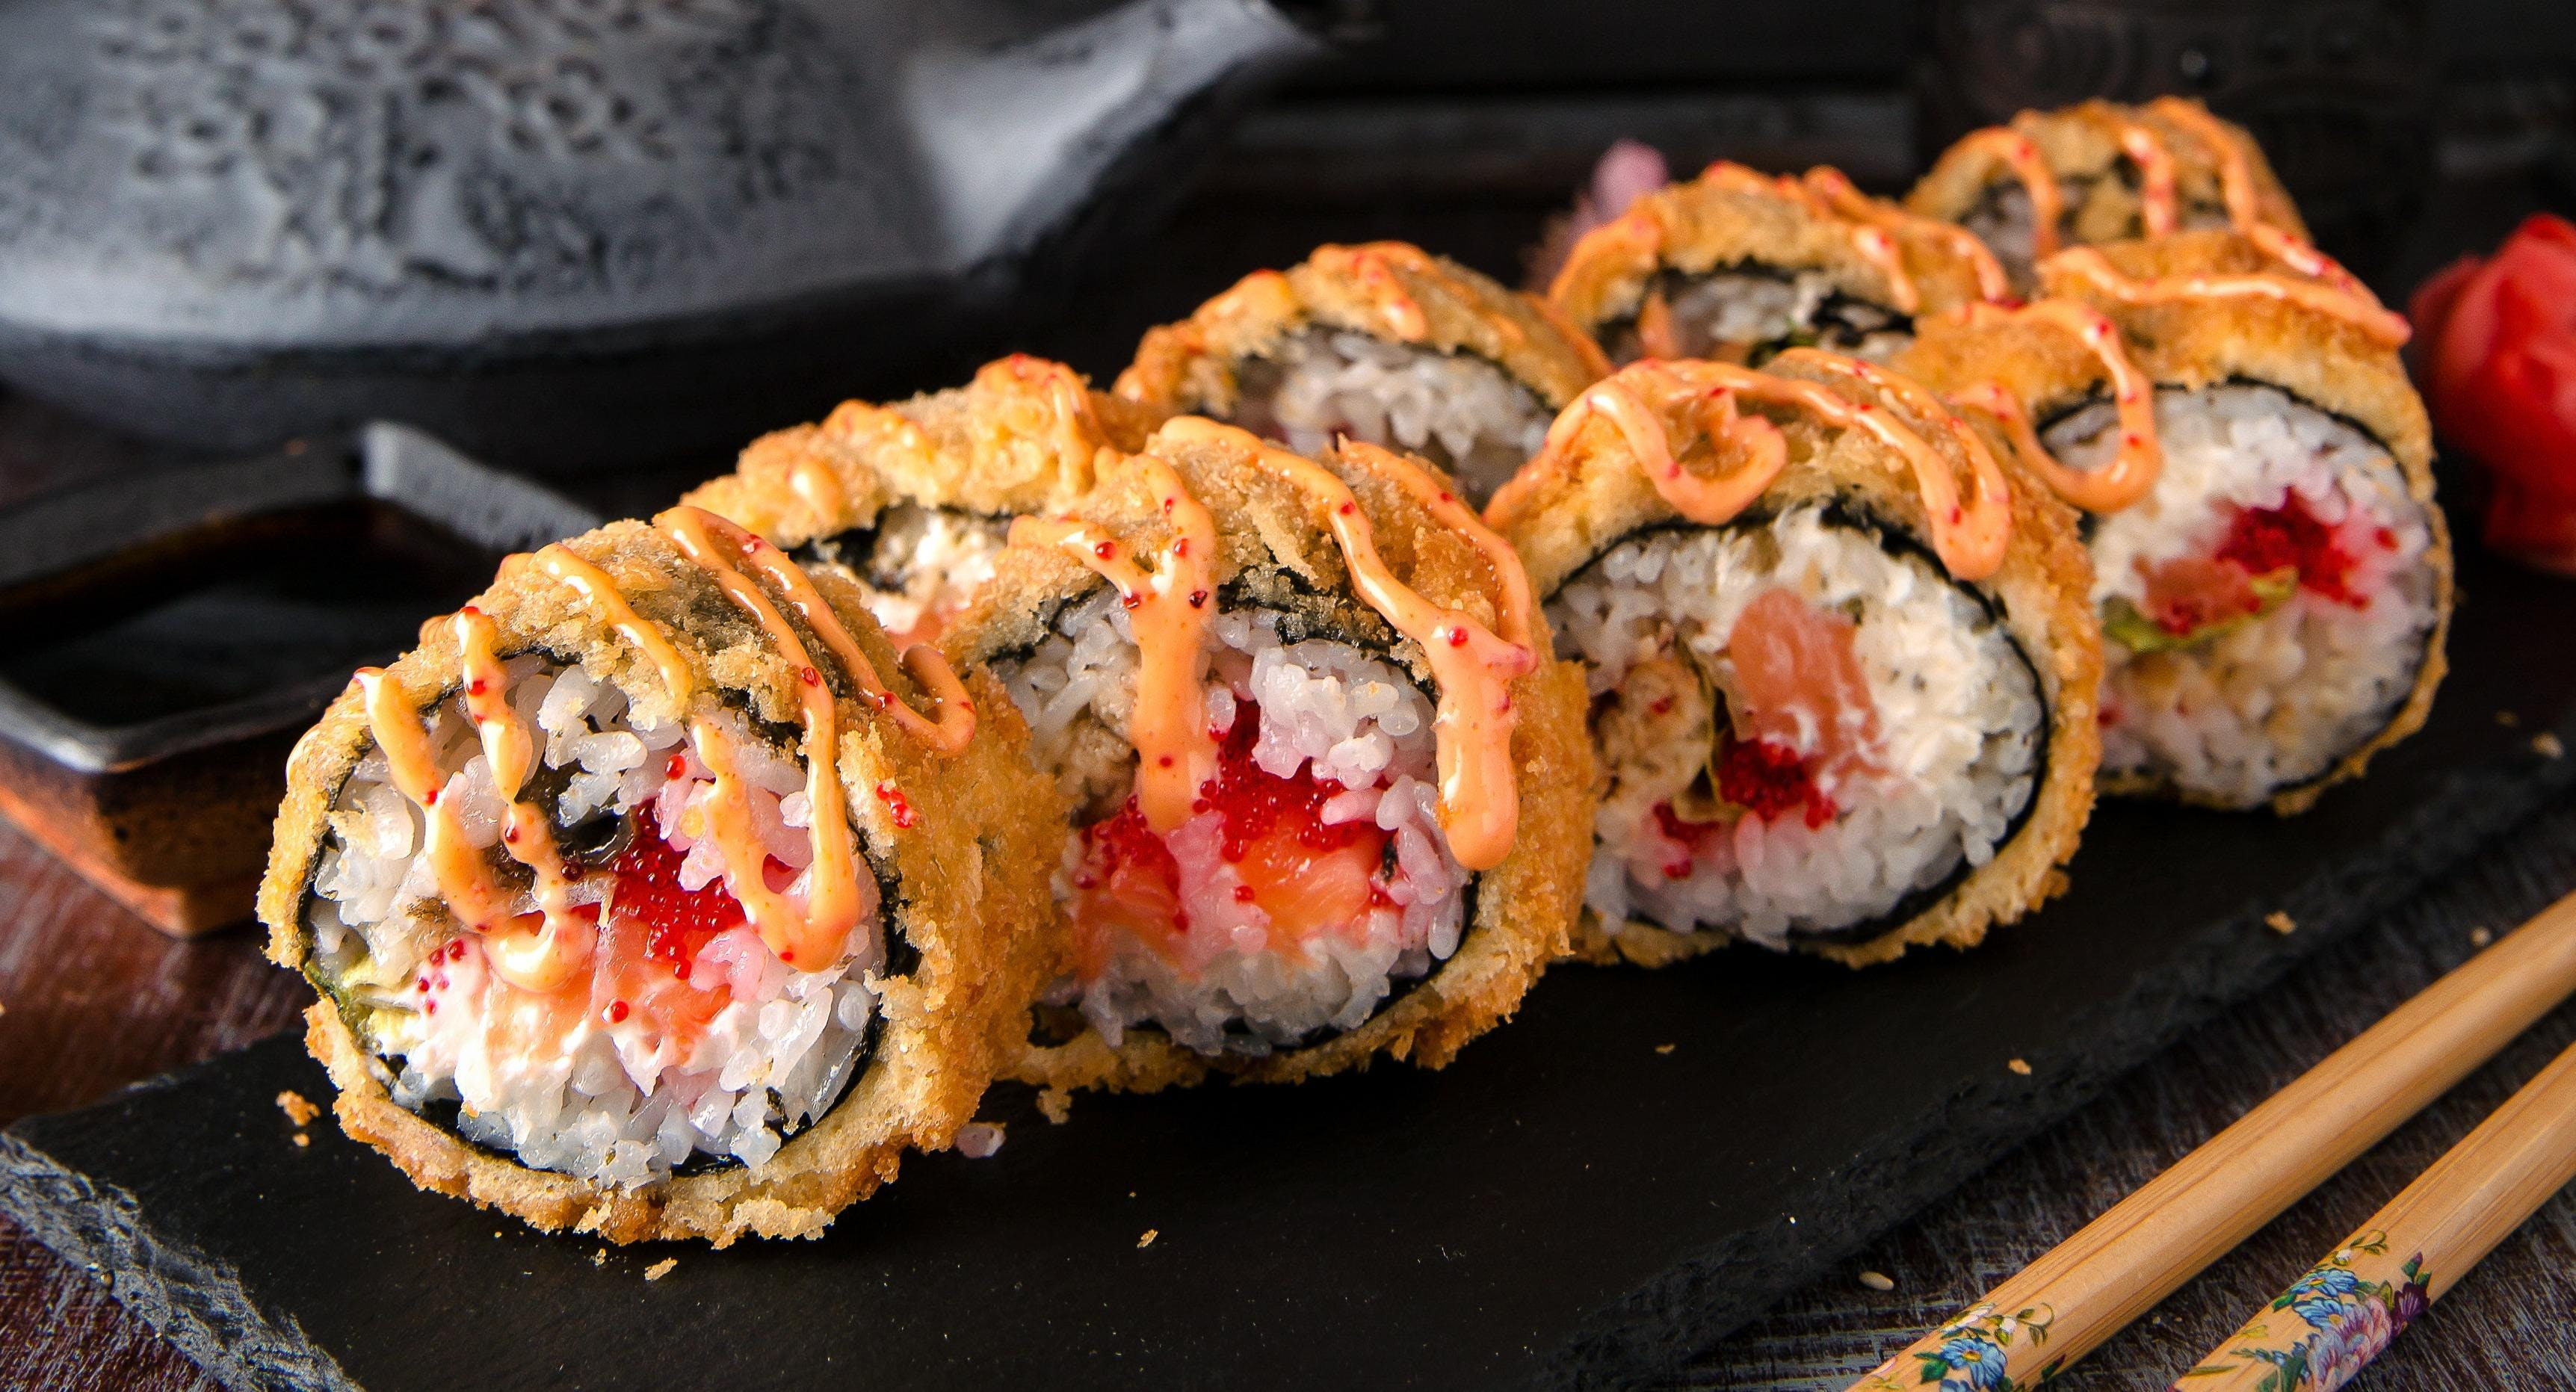 Mii Tii Sushi